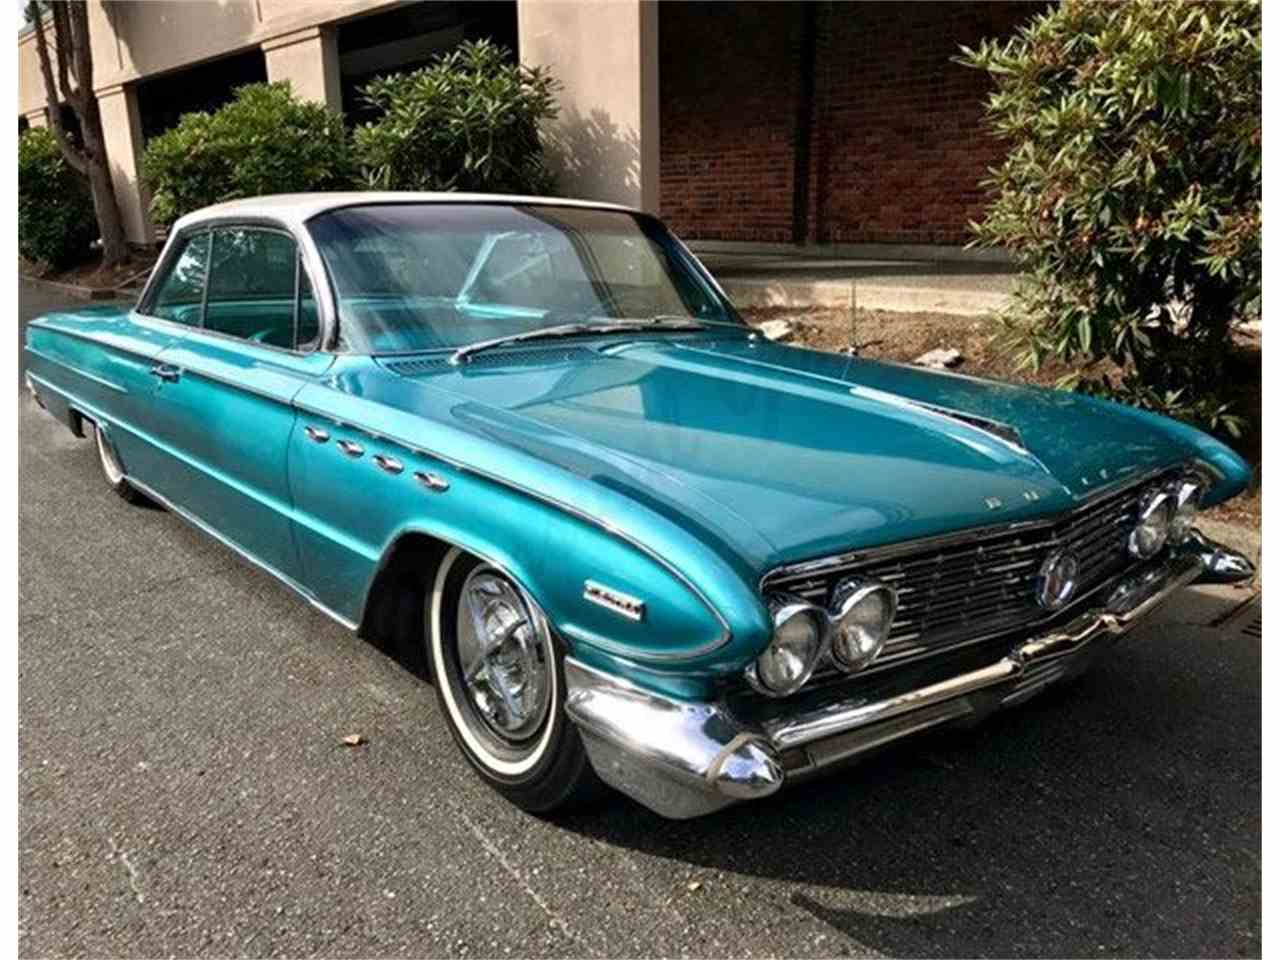 1961 Buick Electra Convertible